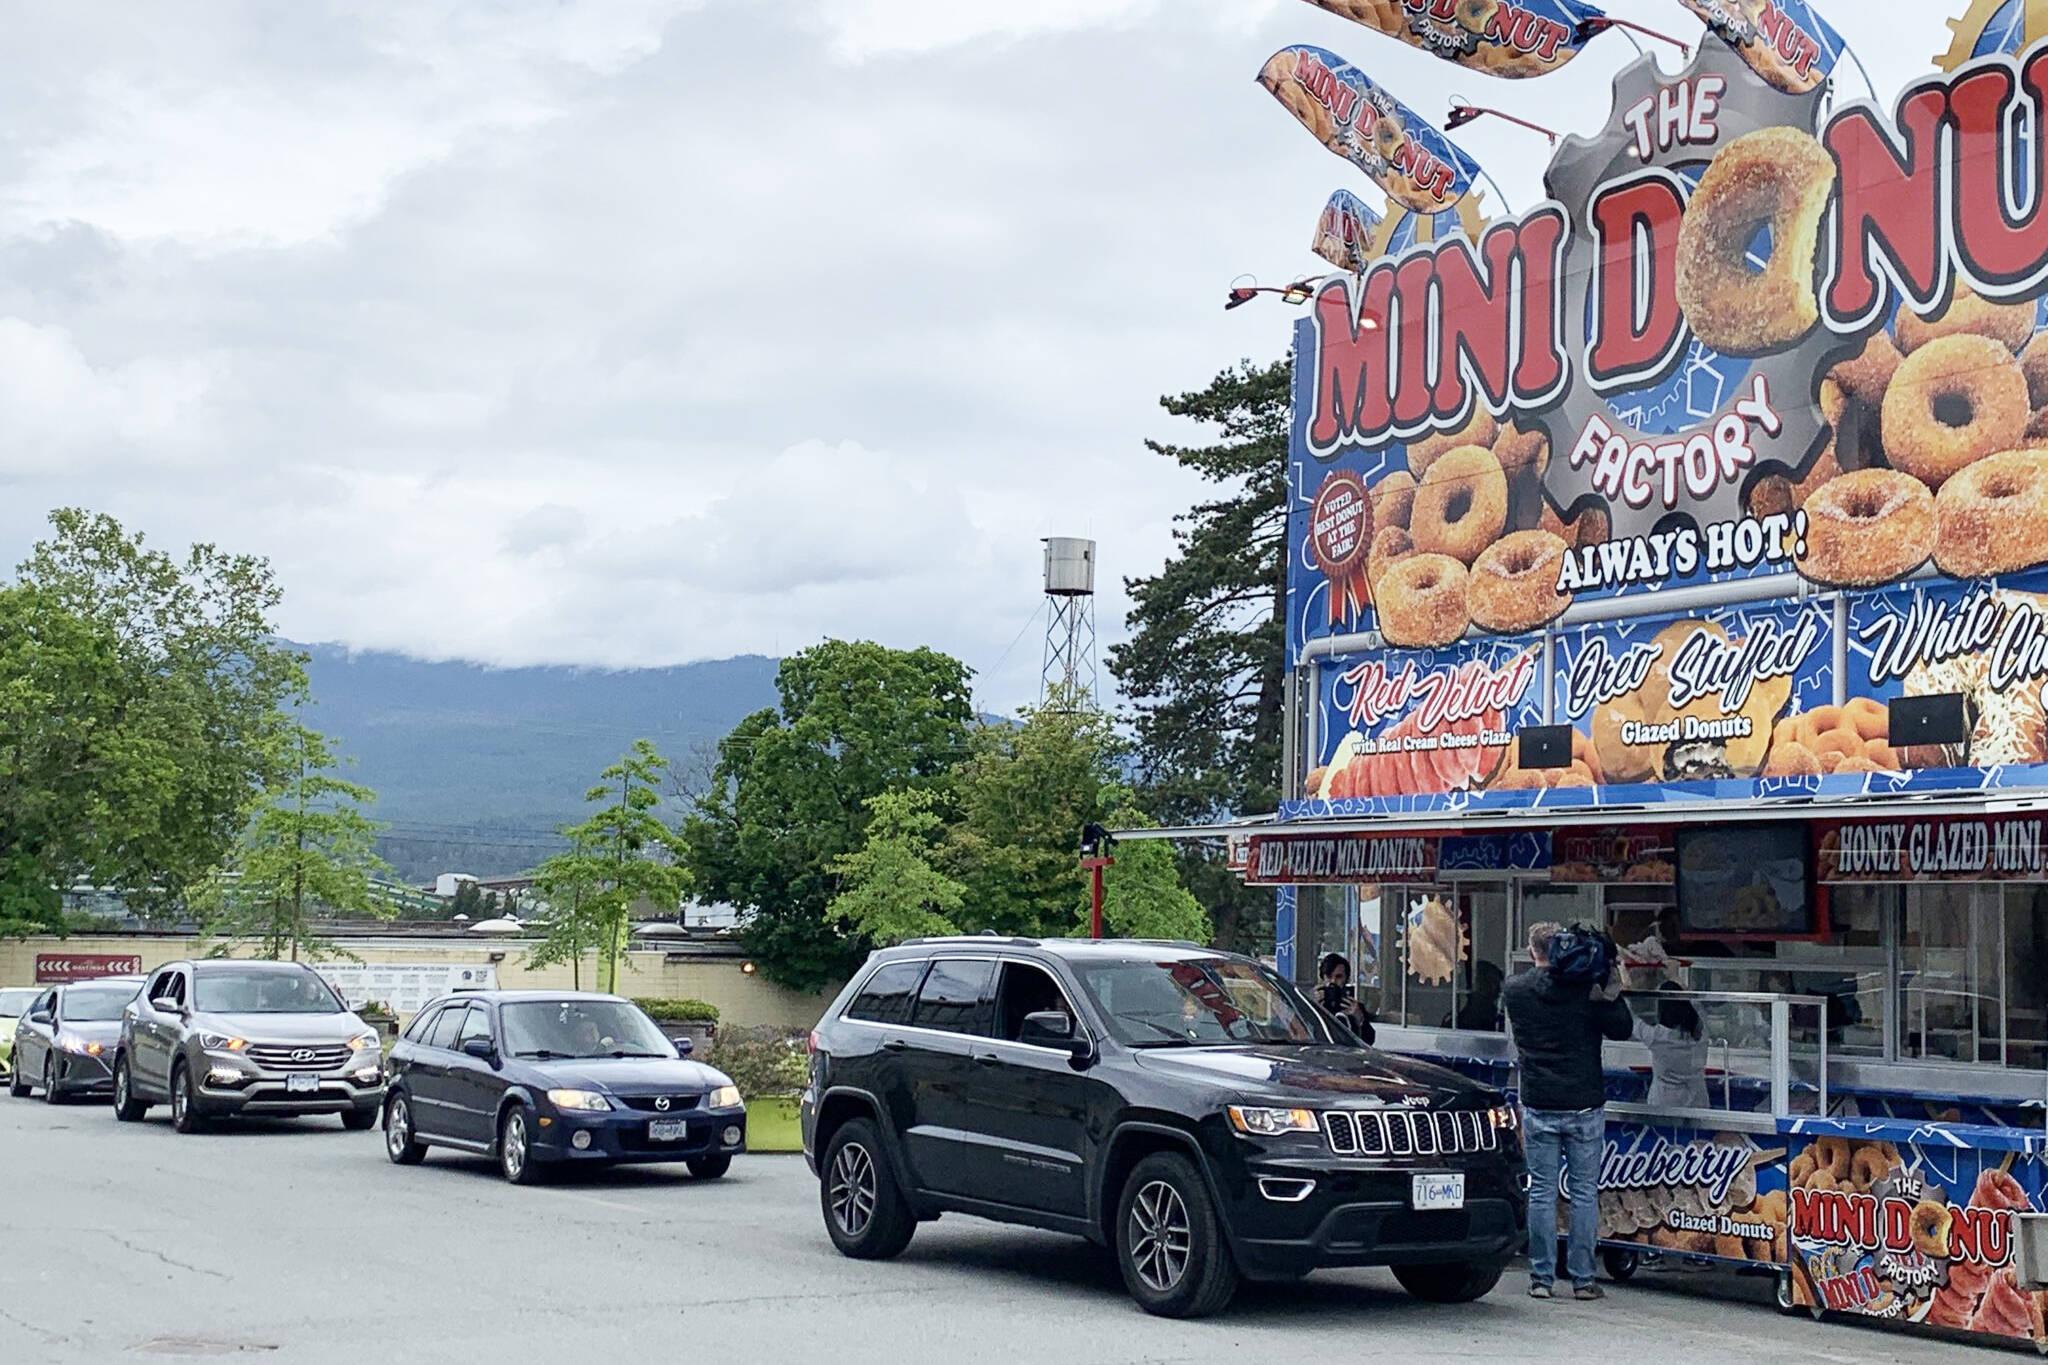 pne mini donuts drive thru